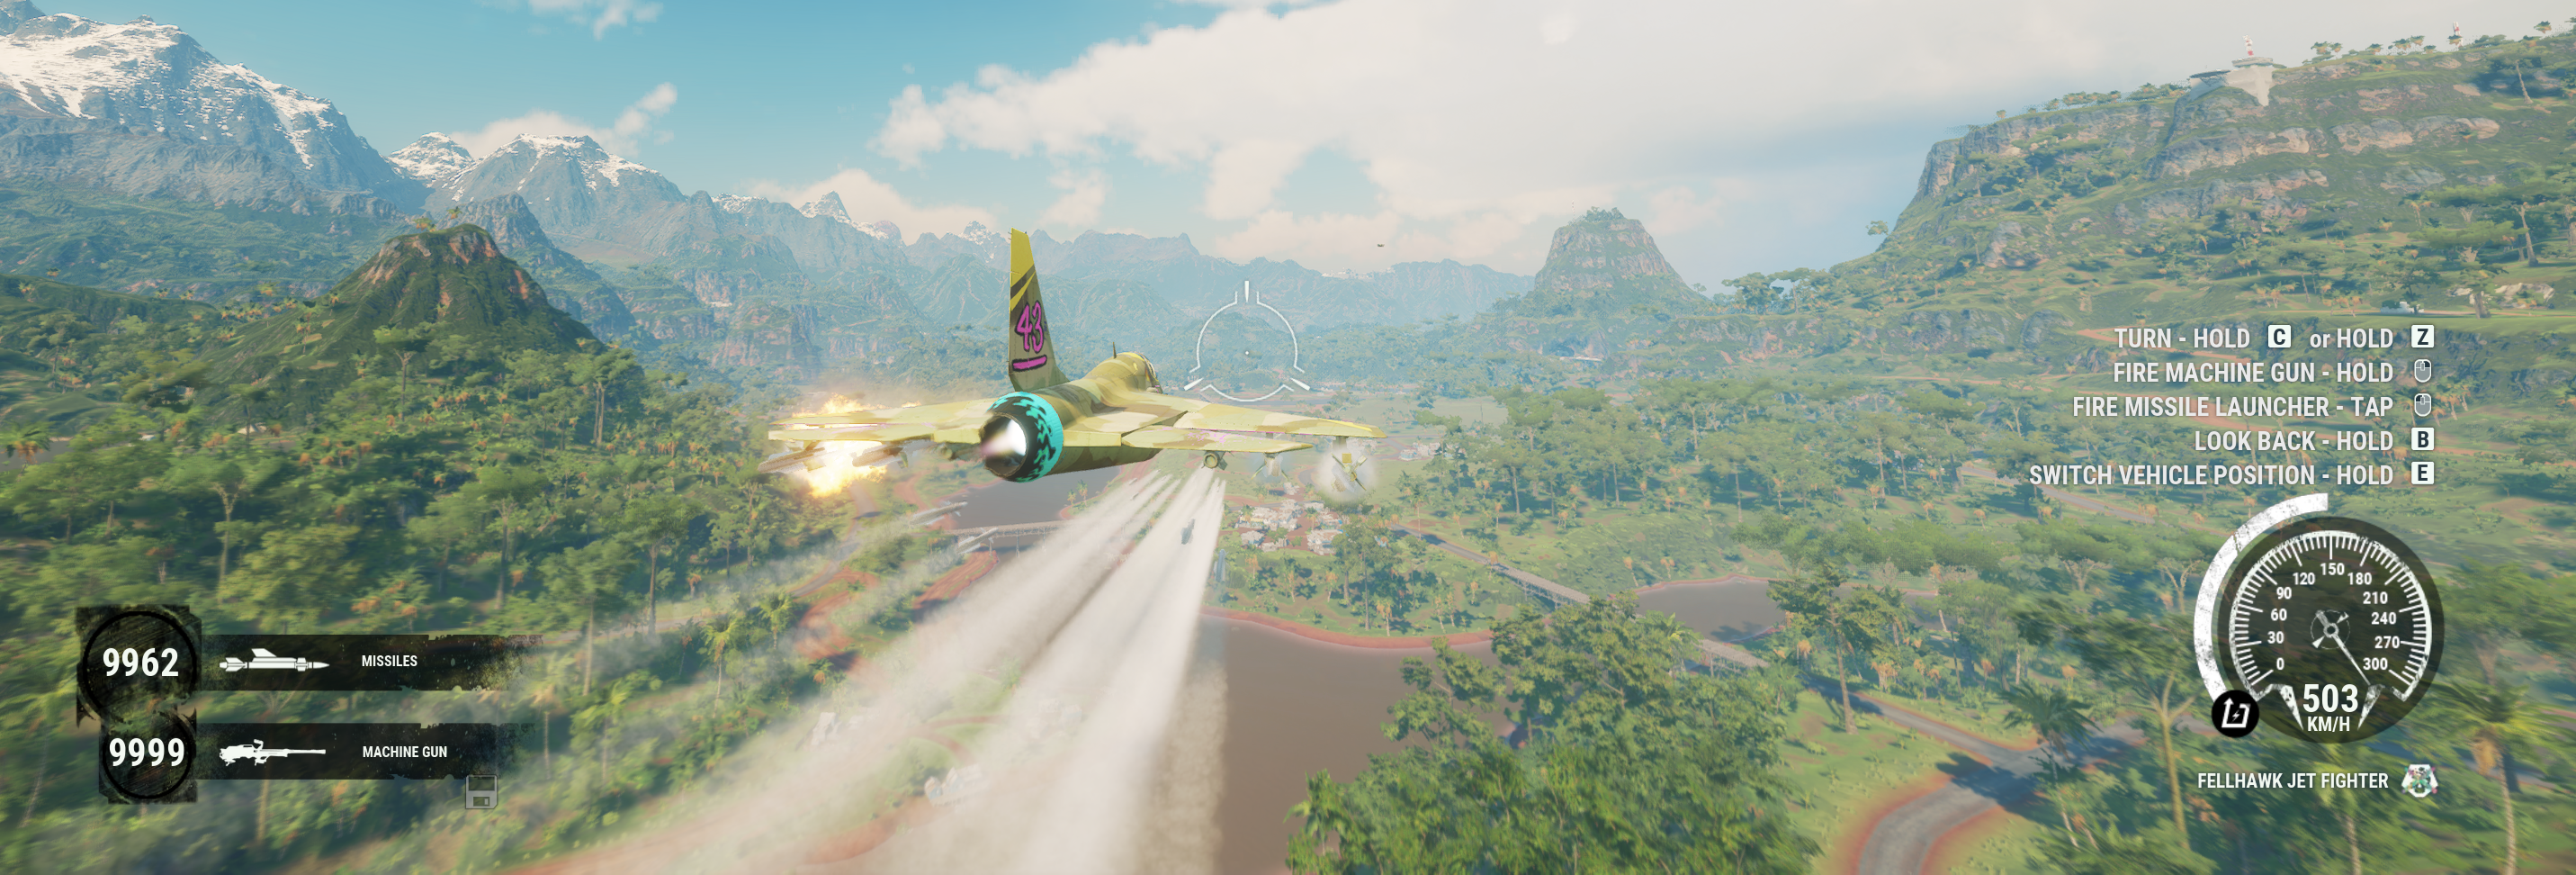 Upgraded fighterjet